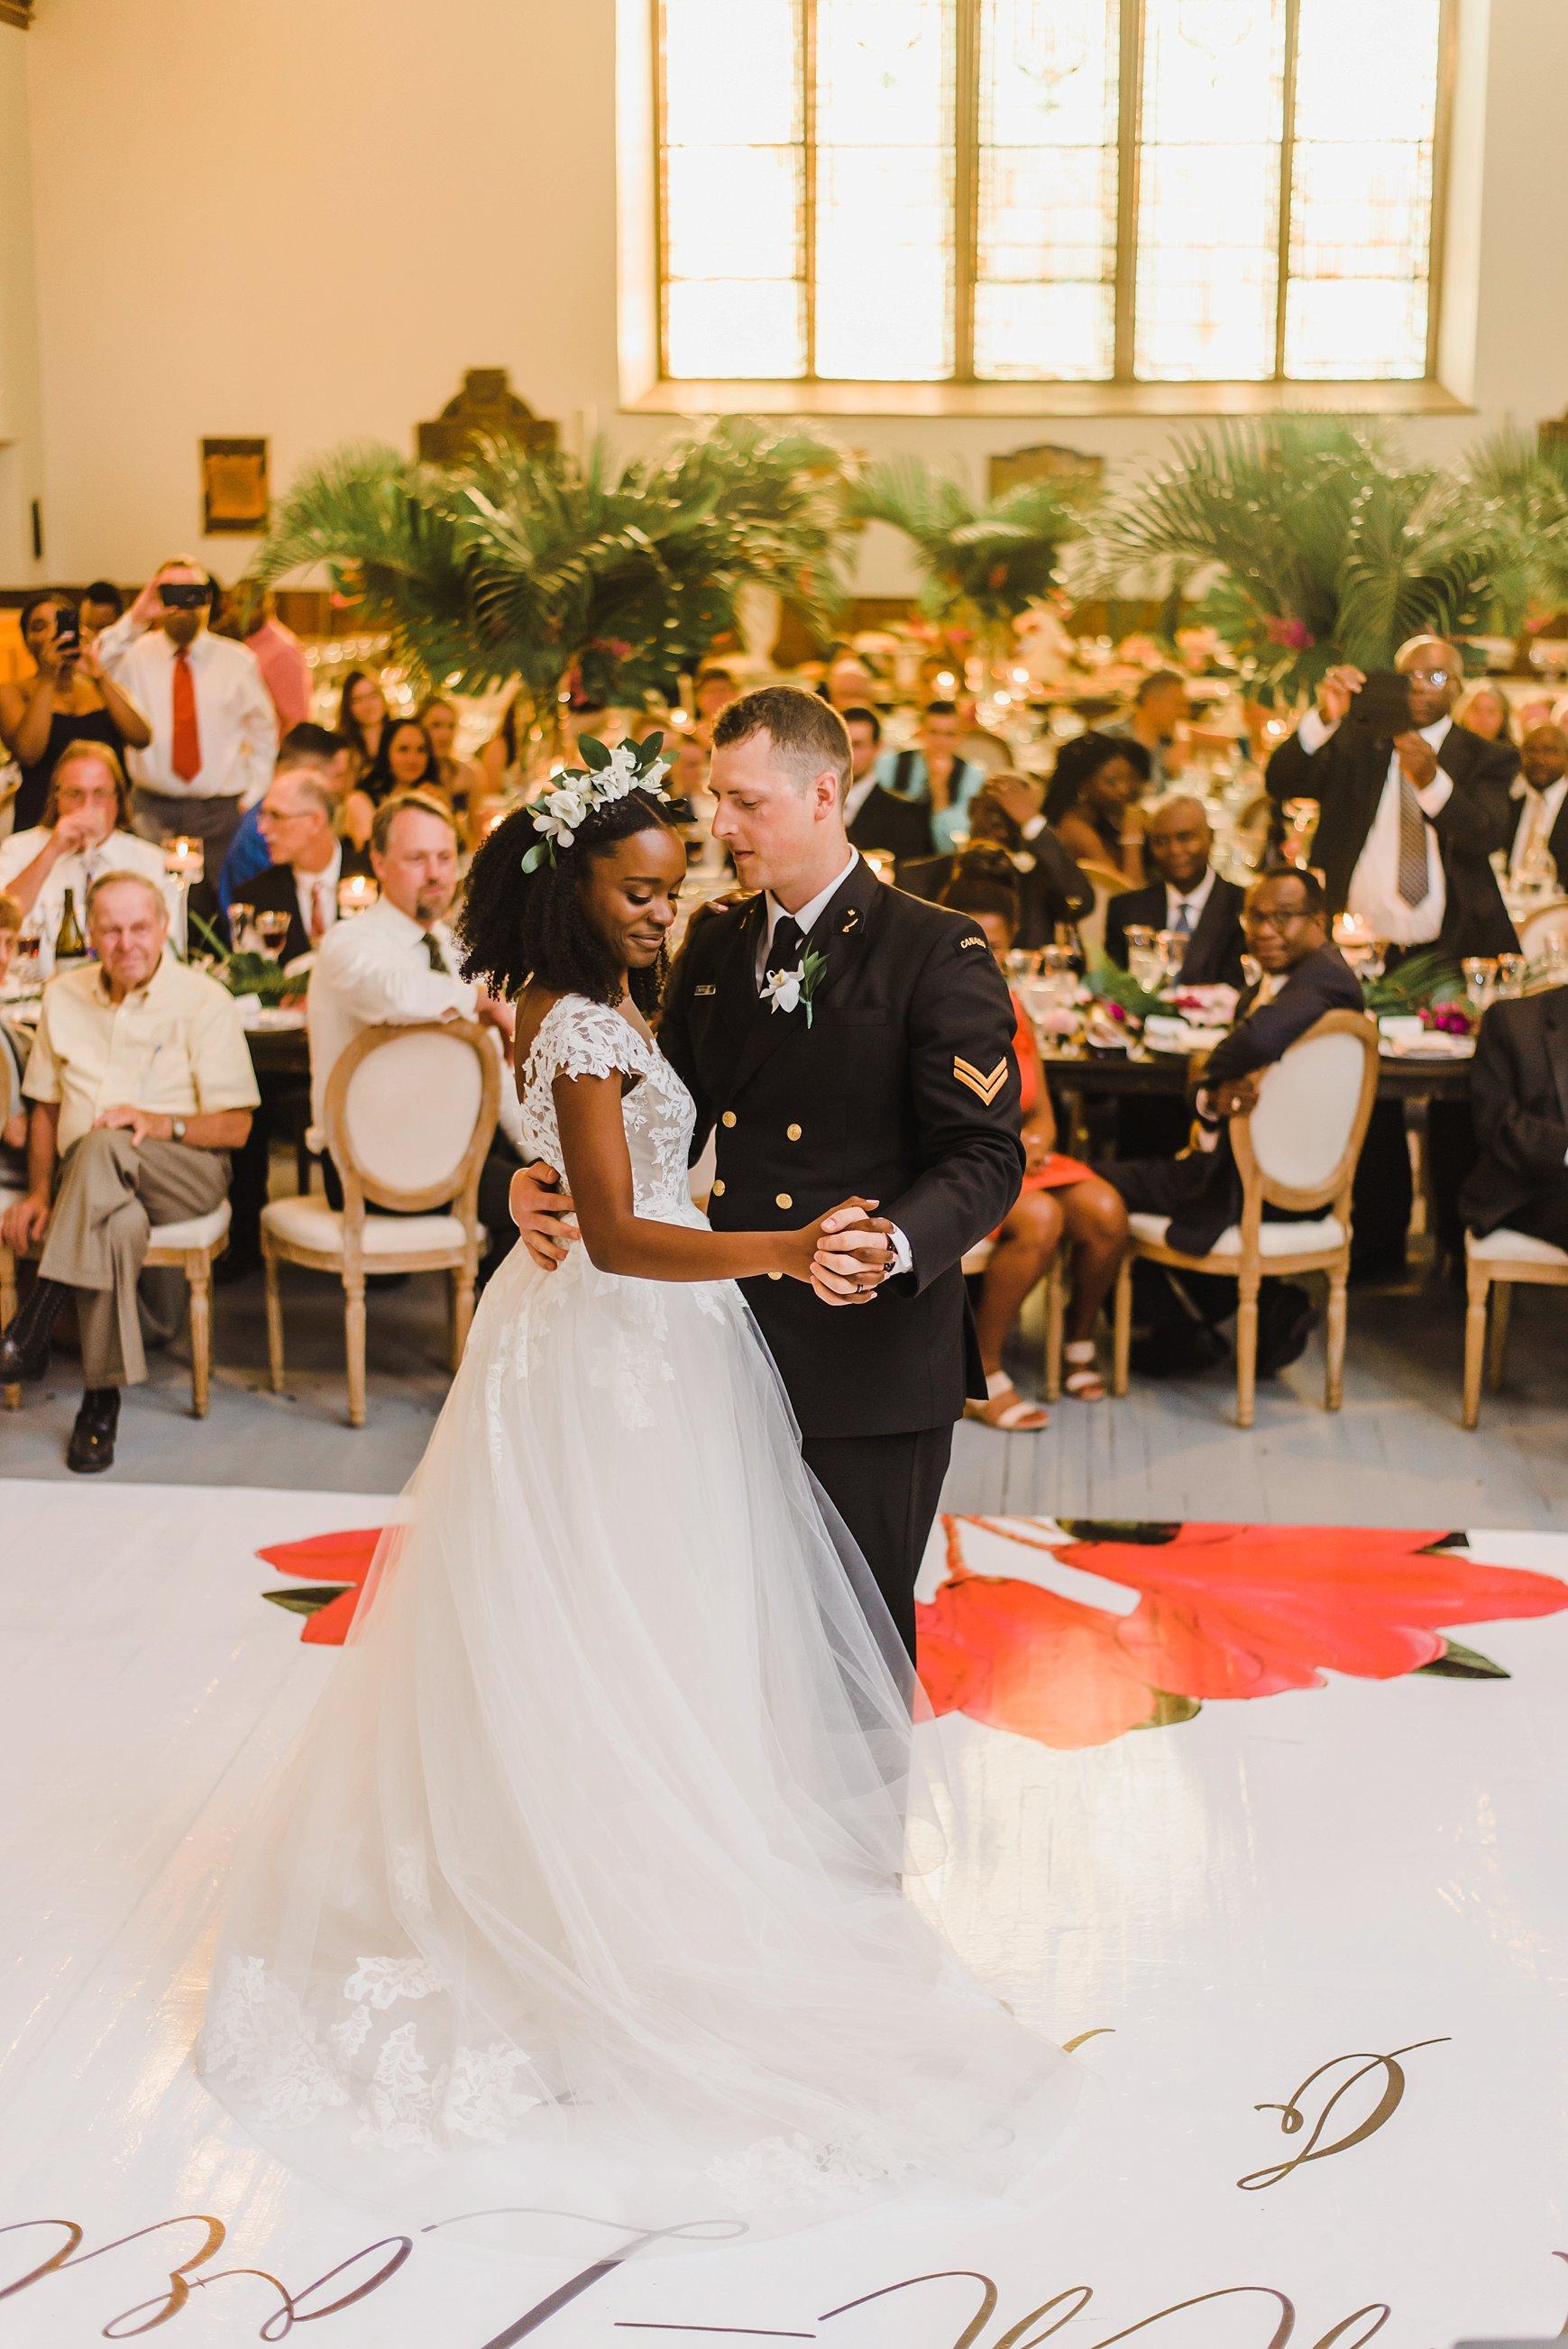 light airy indie fine art ottawa wedding photographer | Ali and Batoul Photography_1033.jpg